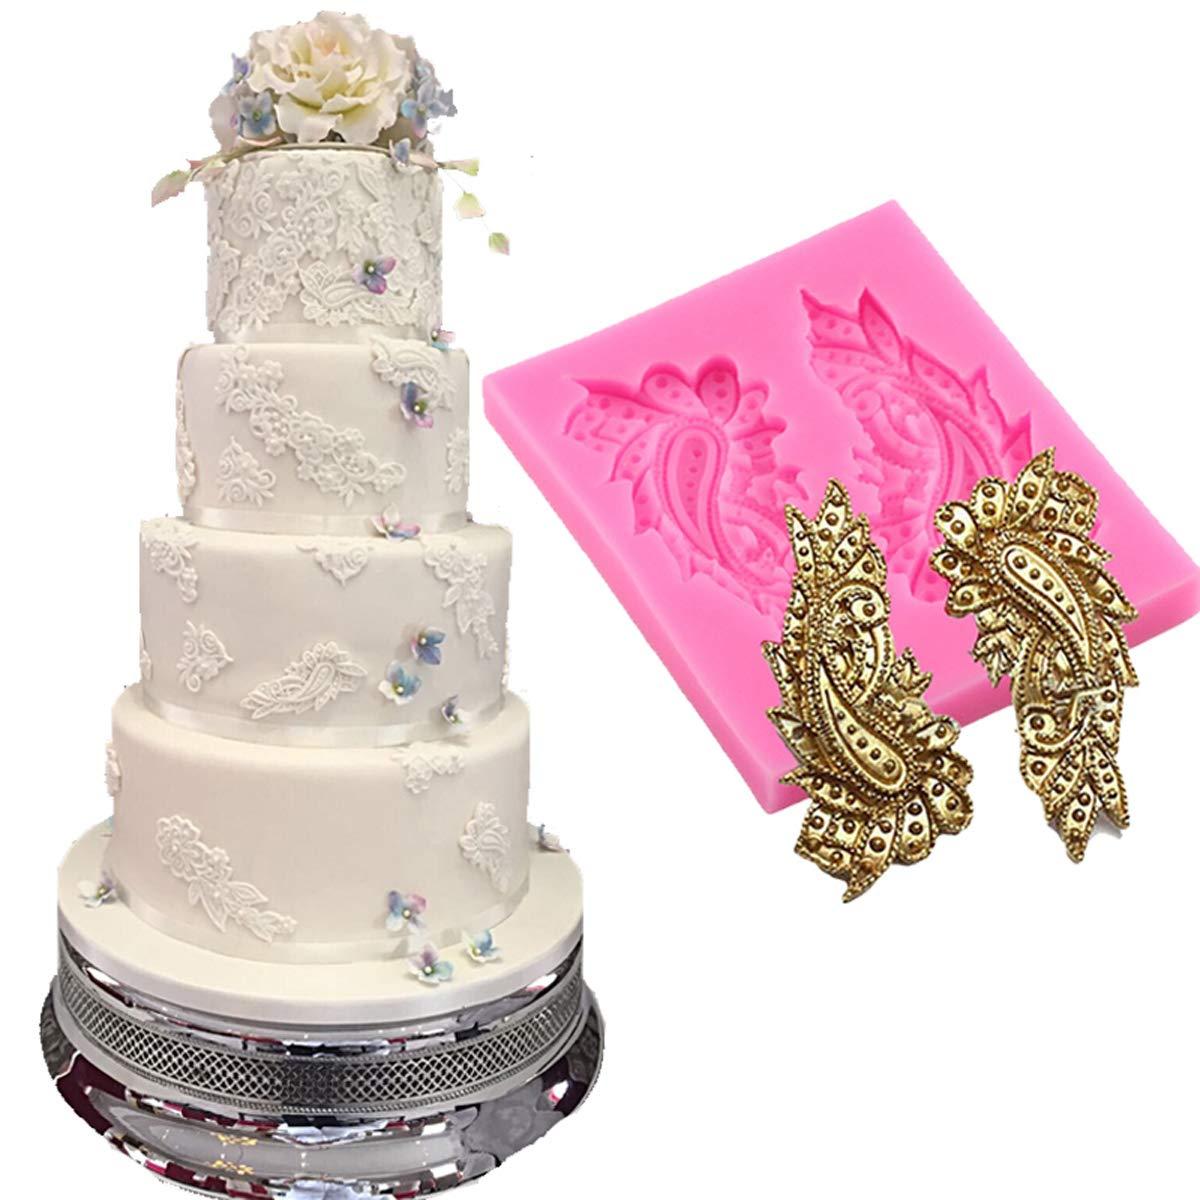 Anyana mini paisley Cupcake Toppers Fondant Sugar Craft Tool Gumpaste Chocolate Moulds